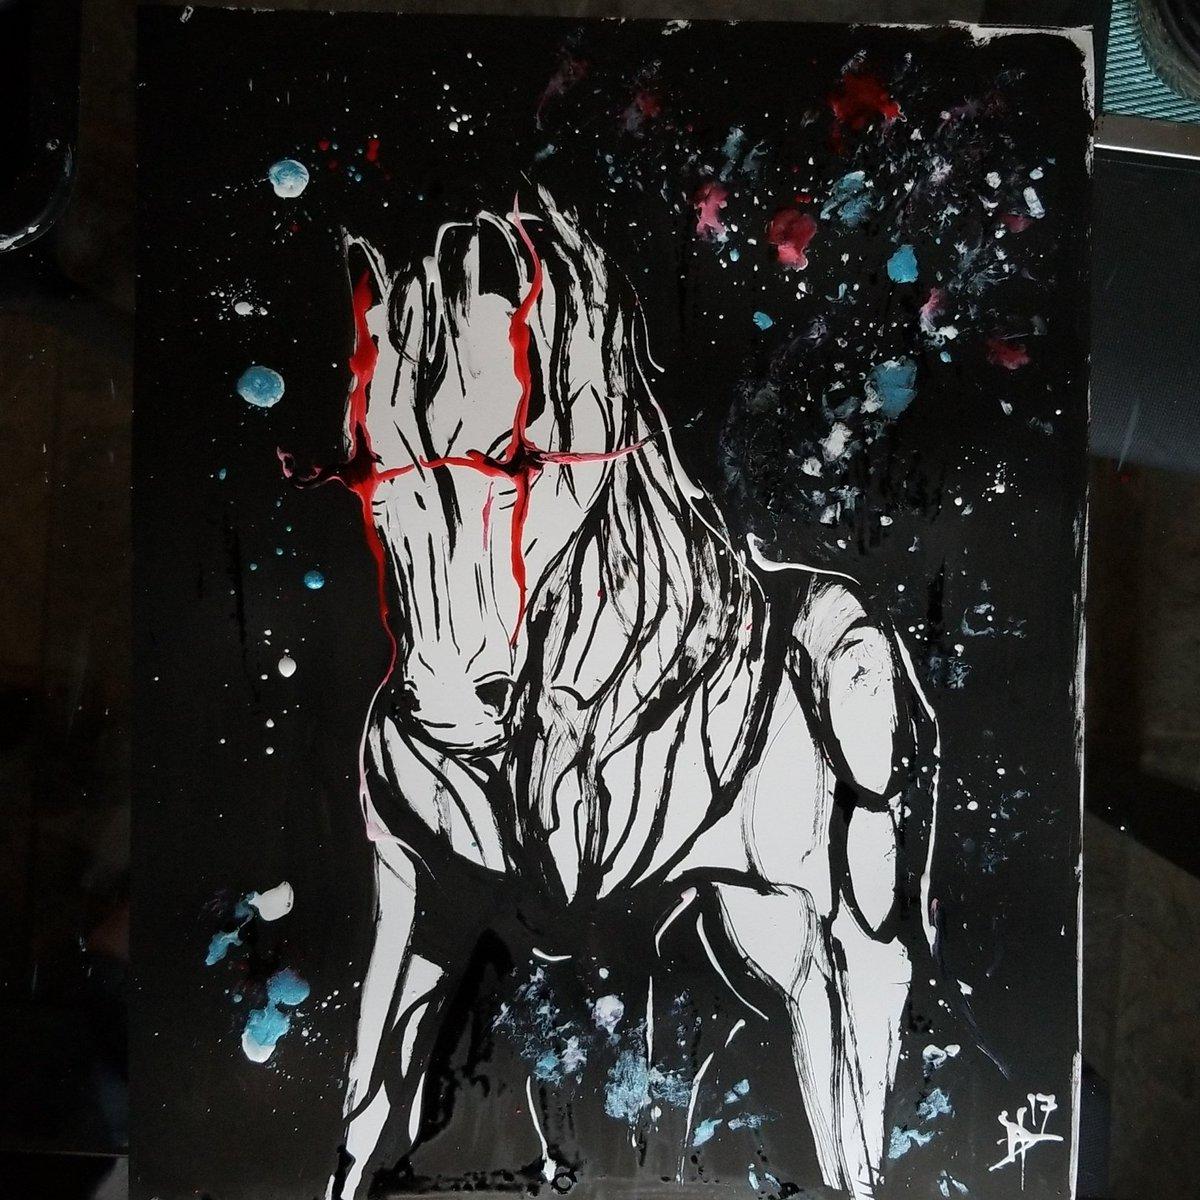 Star Horse 11x14 freehand brushed ink on Bristol paper #ink #inktober #inktober2017 #celestial #horse #starhorse #cosmic<br>http://pic.twitter.com/4JXzMrnThK